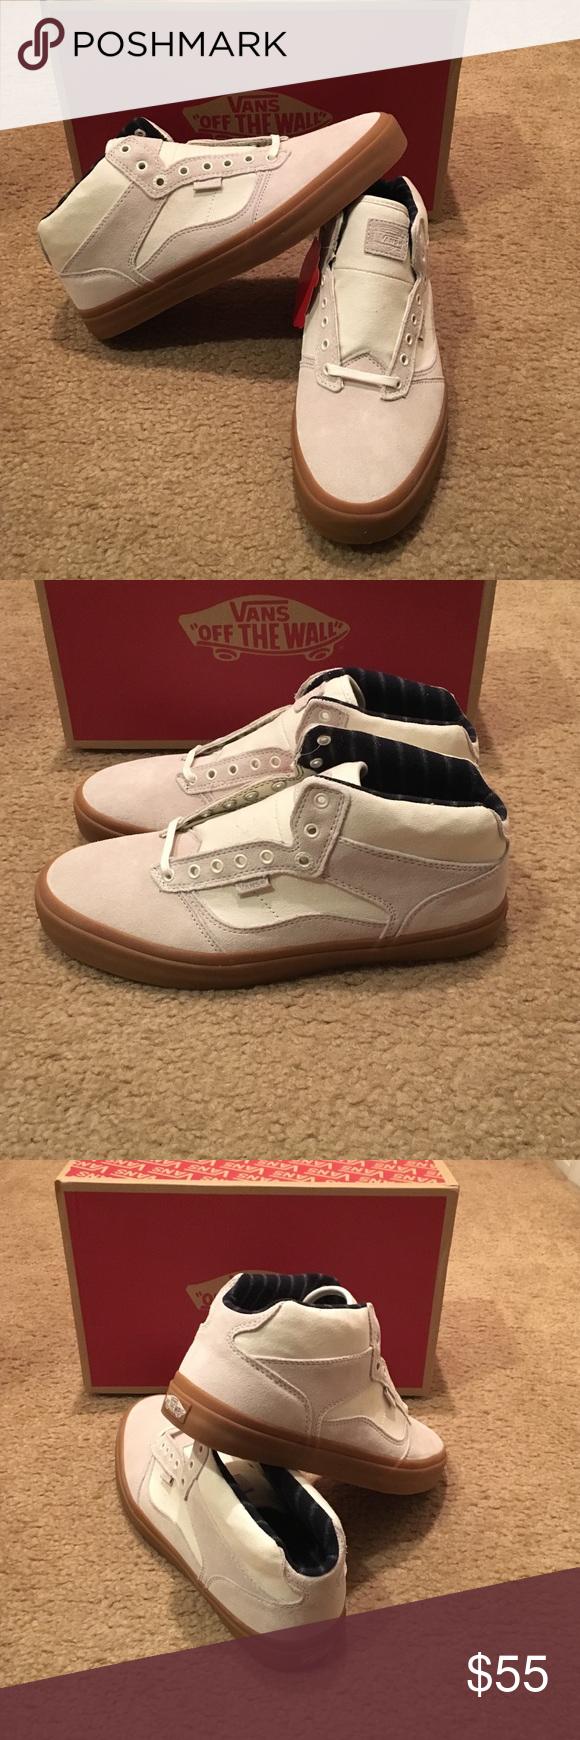 4503b6b959c839 Vans Bedford Canvas Suede Sneakers VN0A2Z5KJWC New in box. Marshmallow Gum Vans  Shoes Sneakers